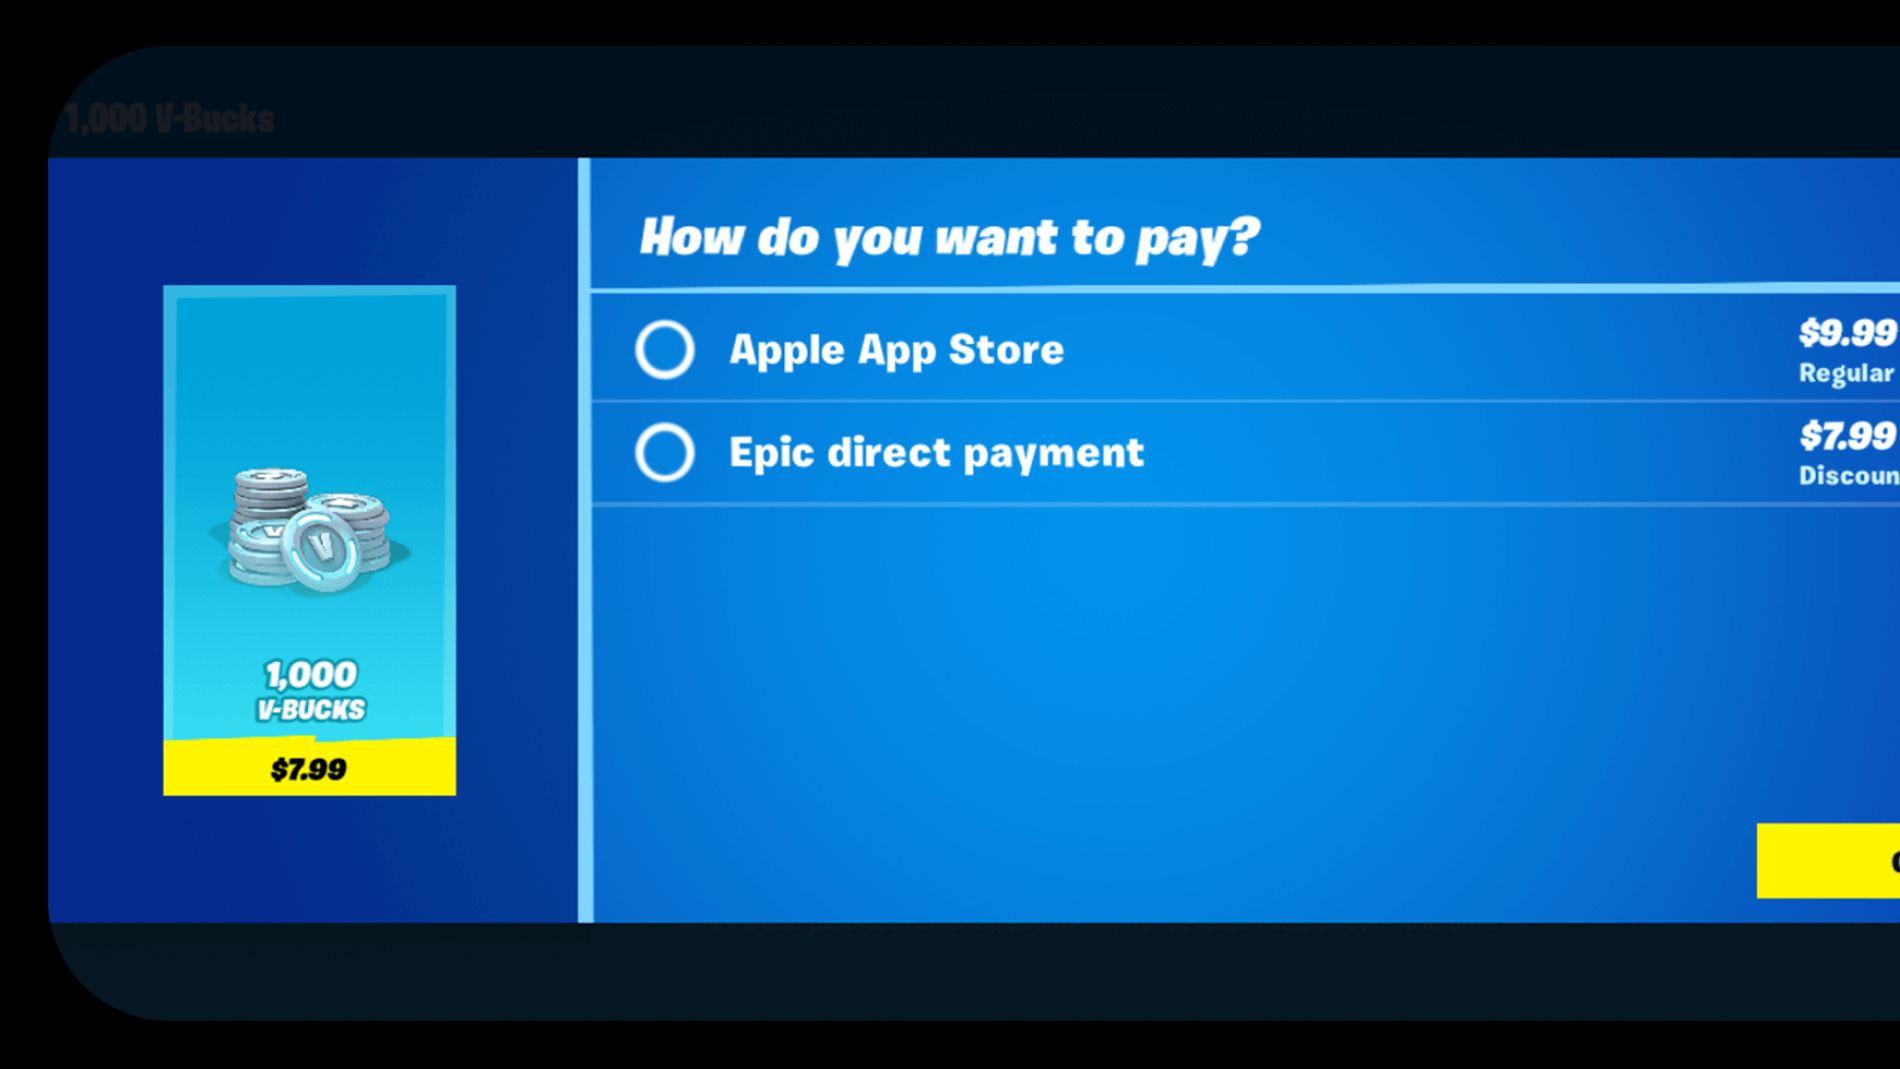 Modelo de pago directo de Epic Games en Fortnite